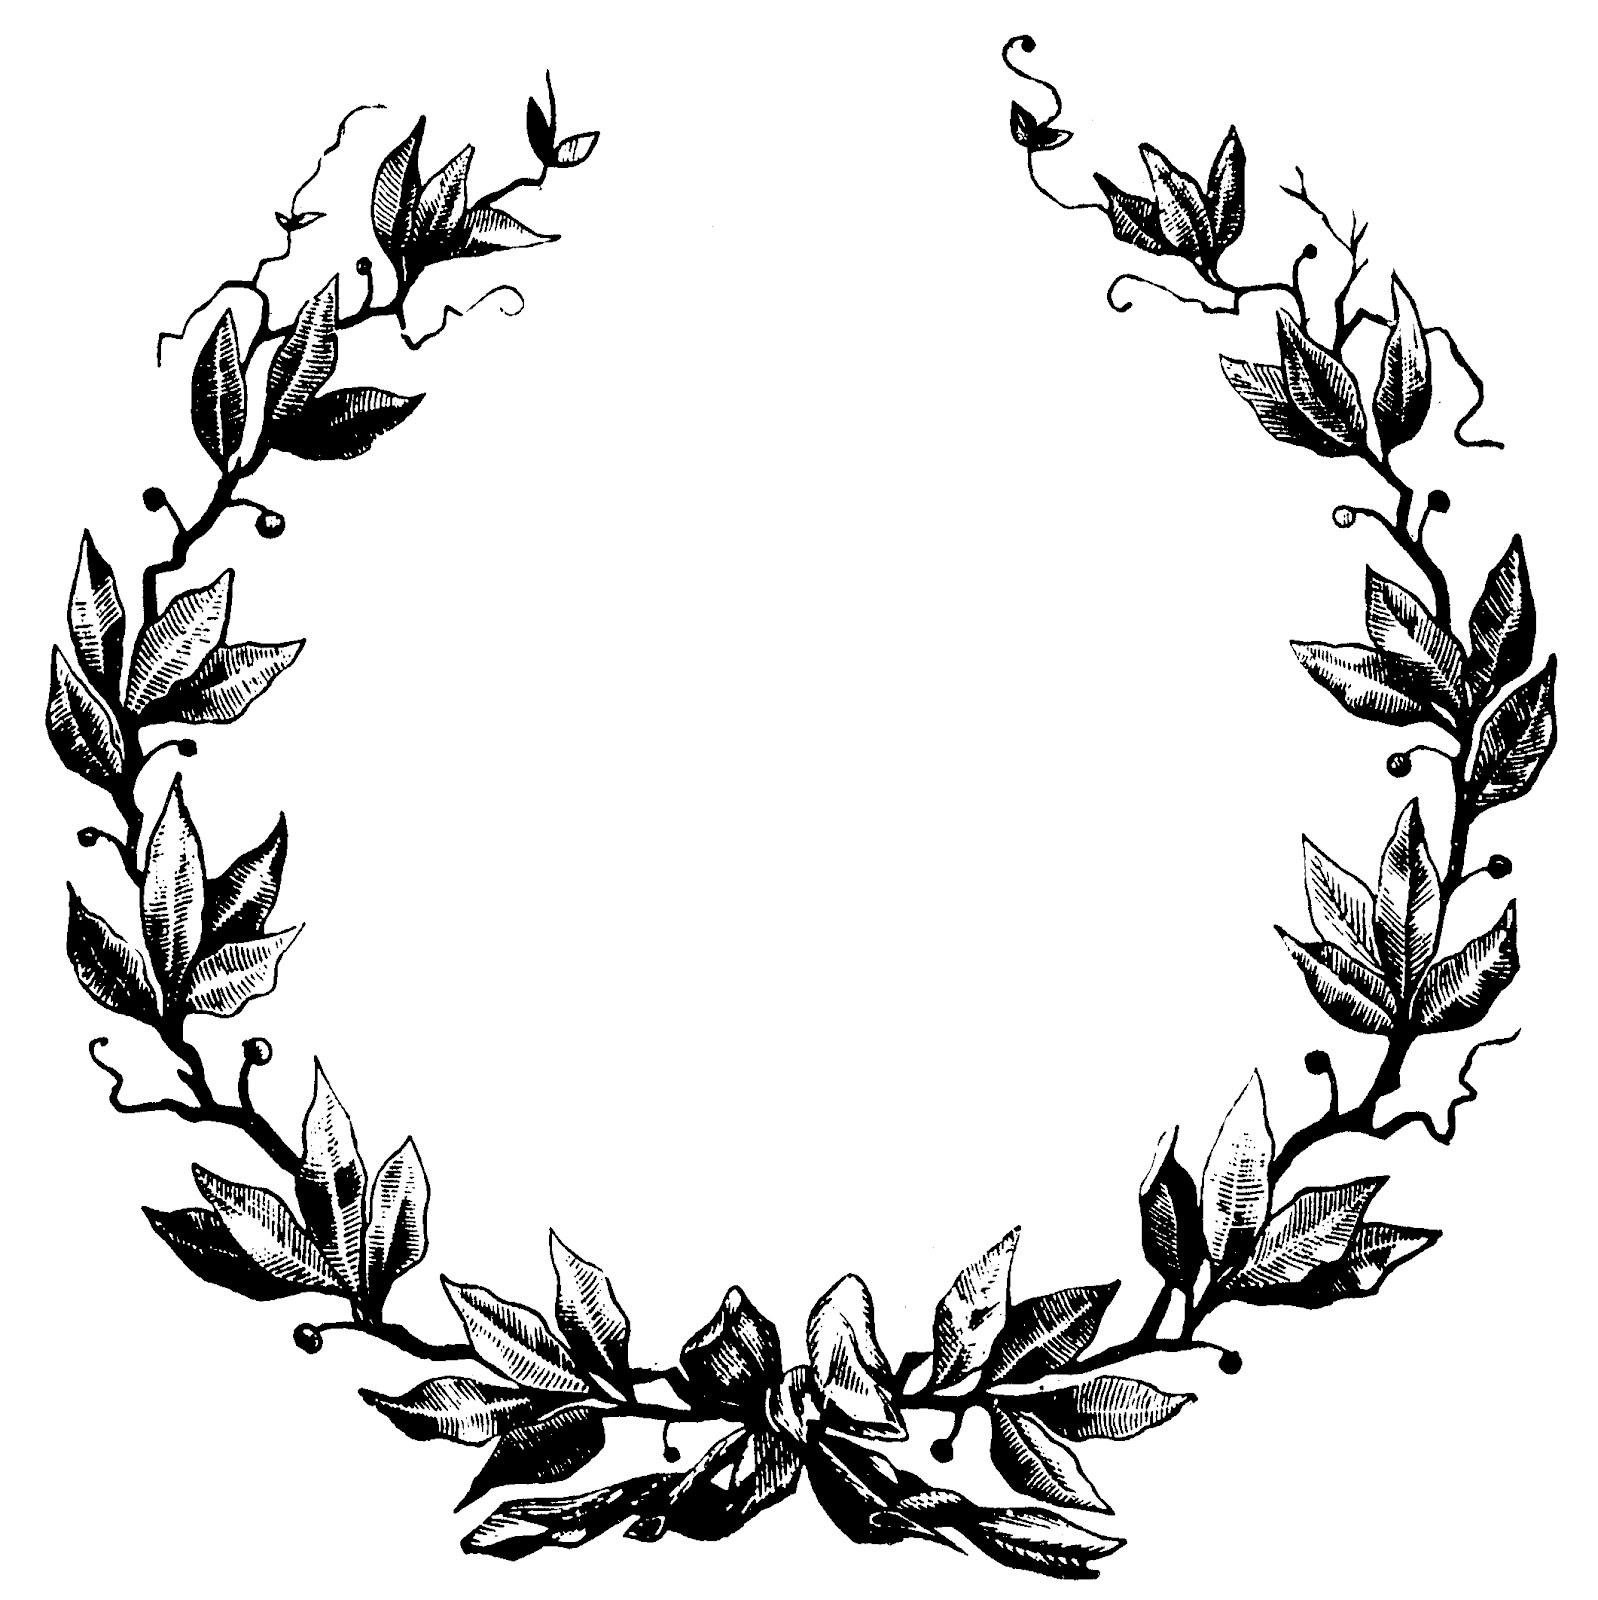 Classical clipart wreath Craft imágenes la ideas Álbum